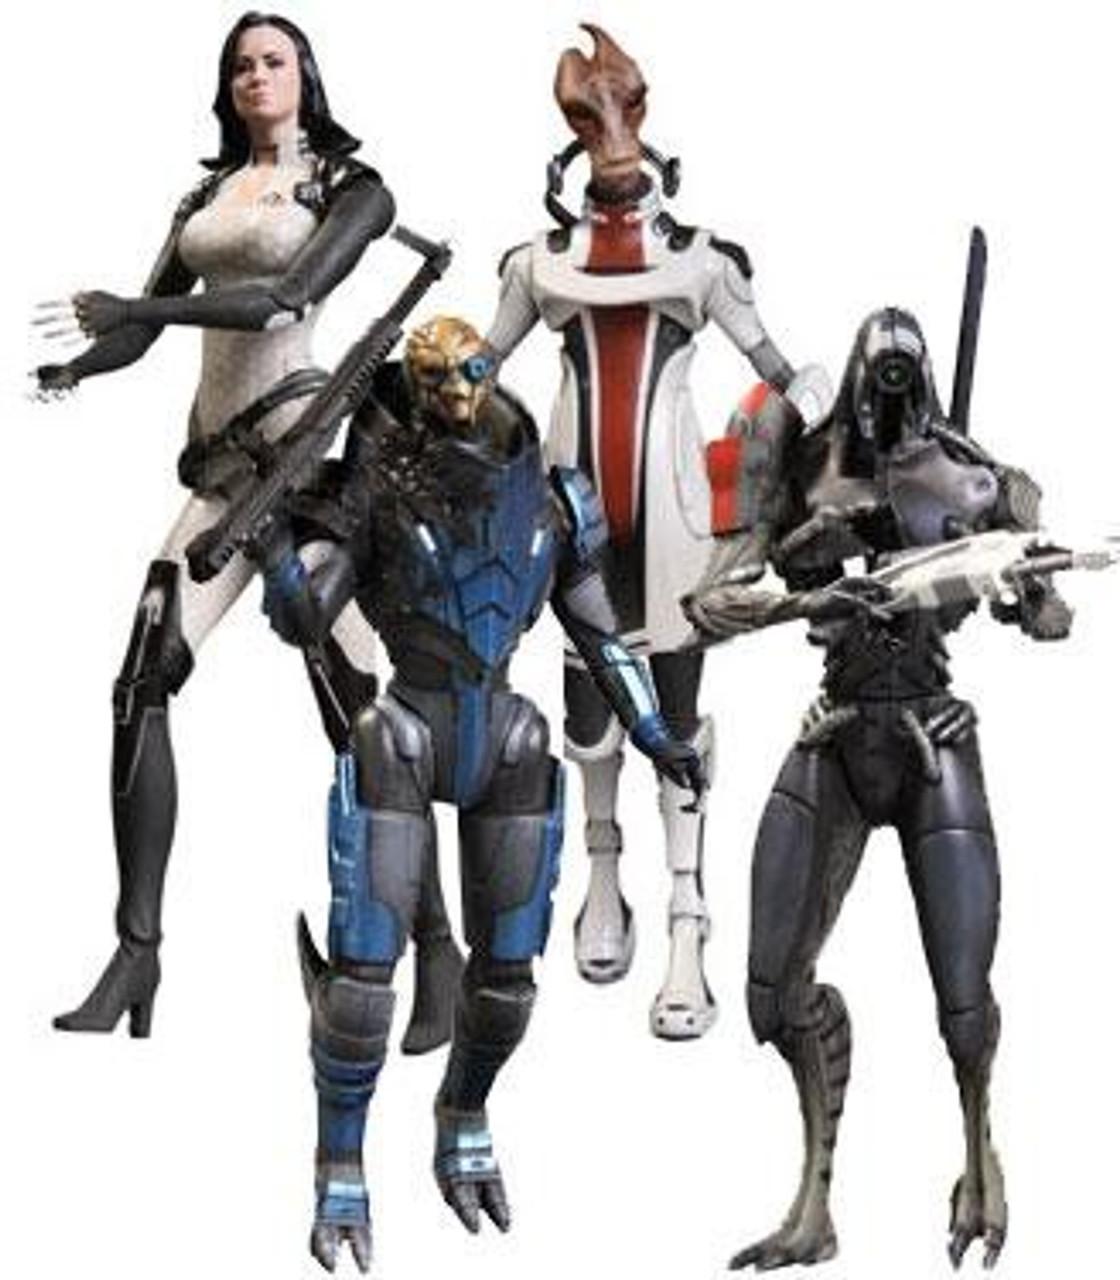 Mass Effect 3 Series 2 Set of 4 Action Figures